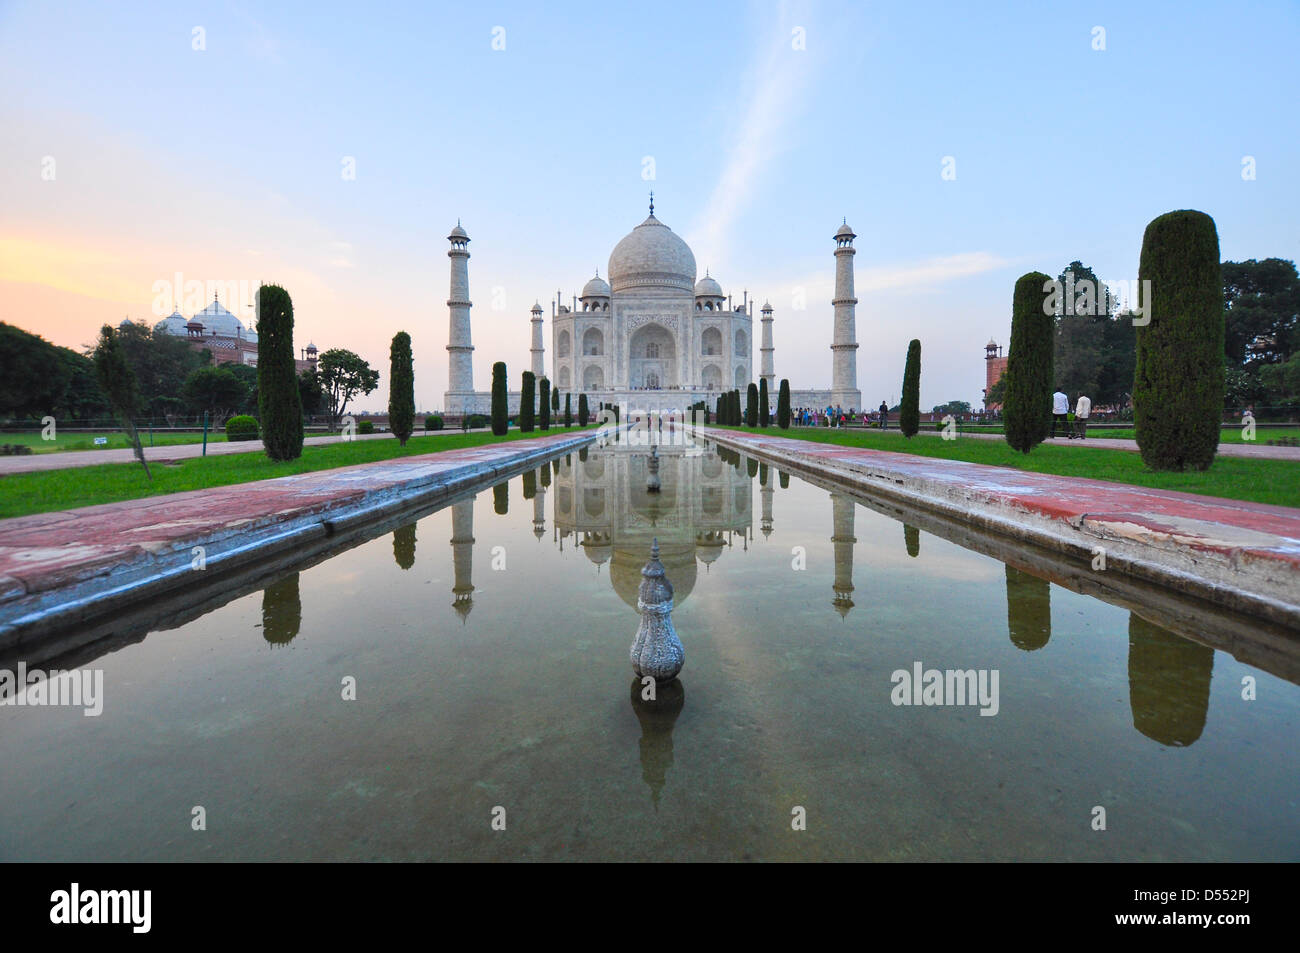 India, Uttar Pradesh, Agra, The Taj Mahal - Stock Image